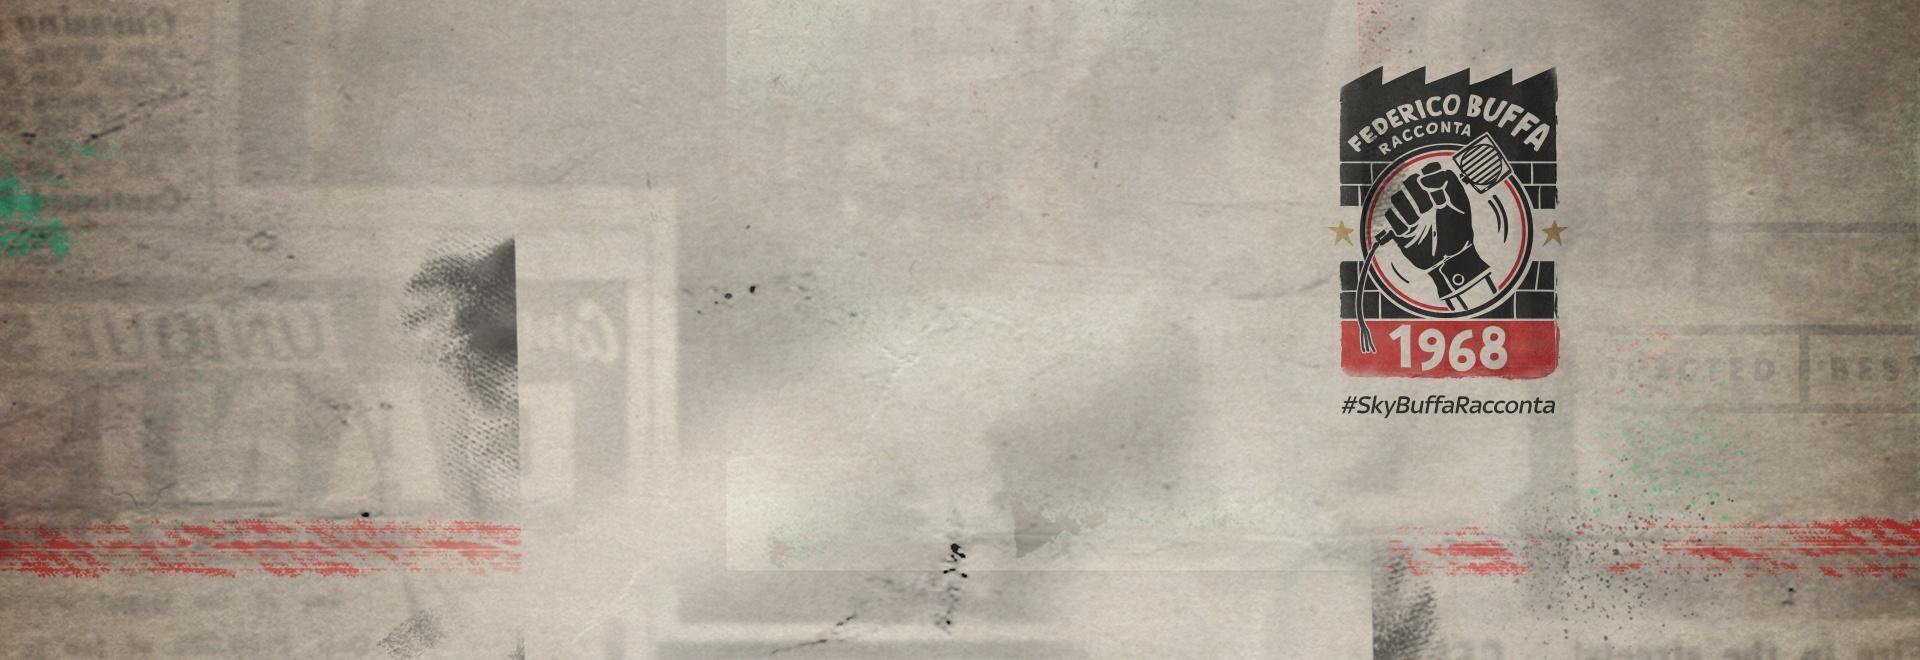 #SkyBuffaRacconta 1968